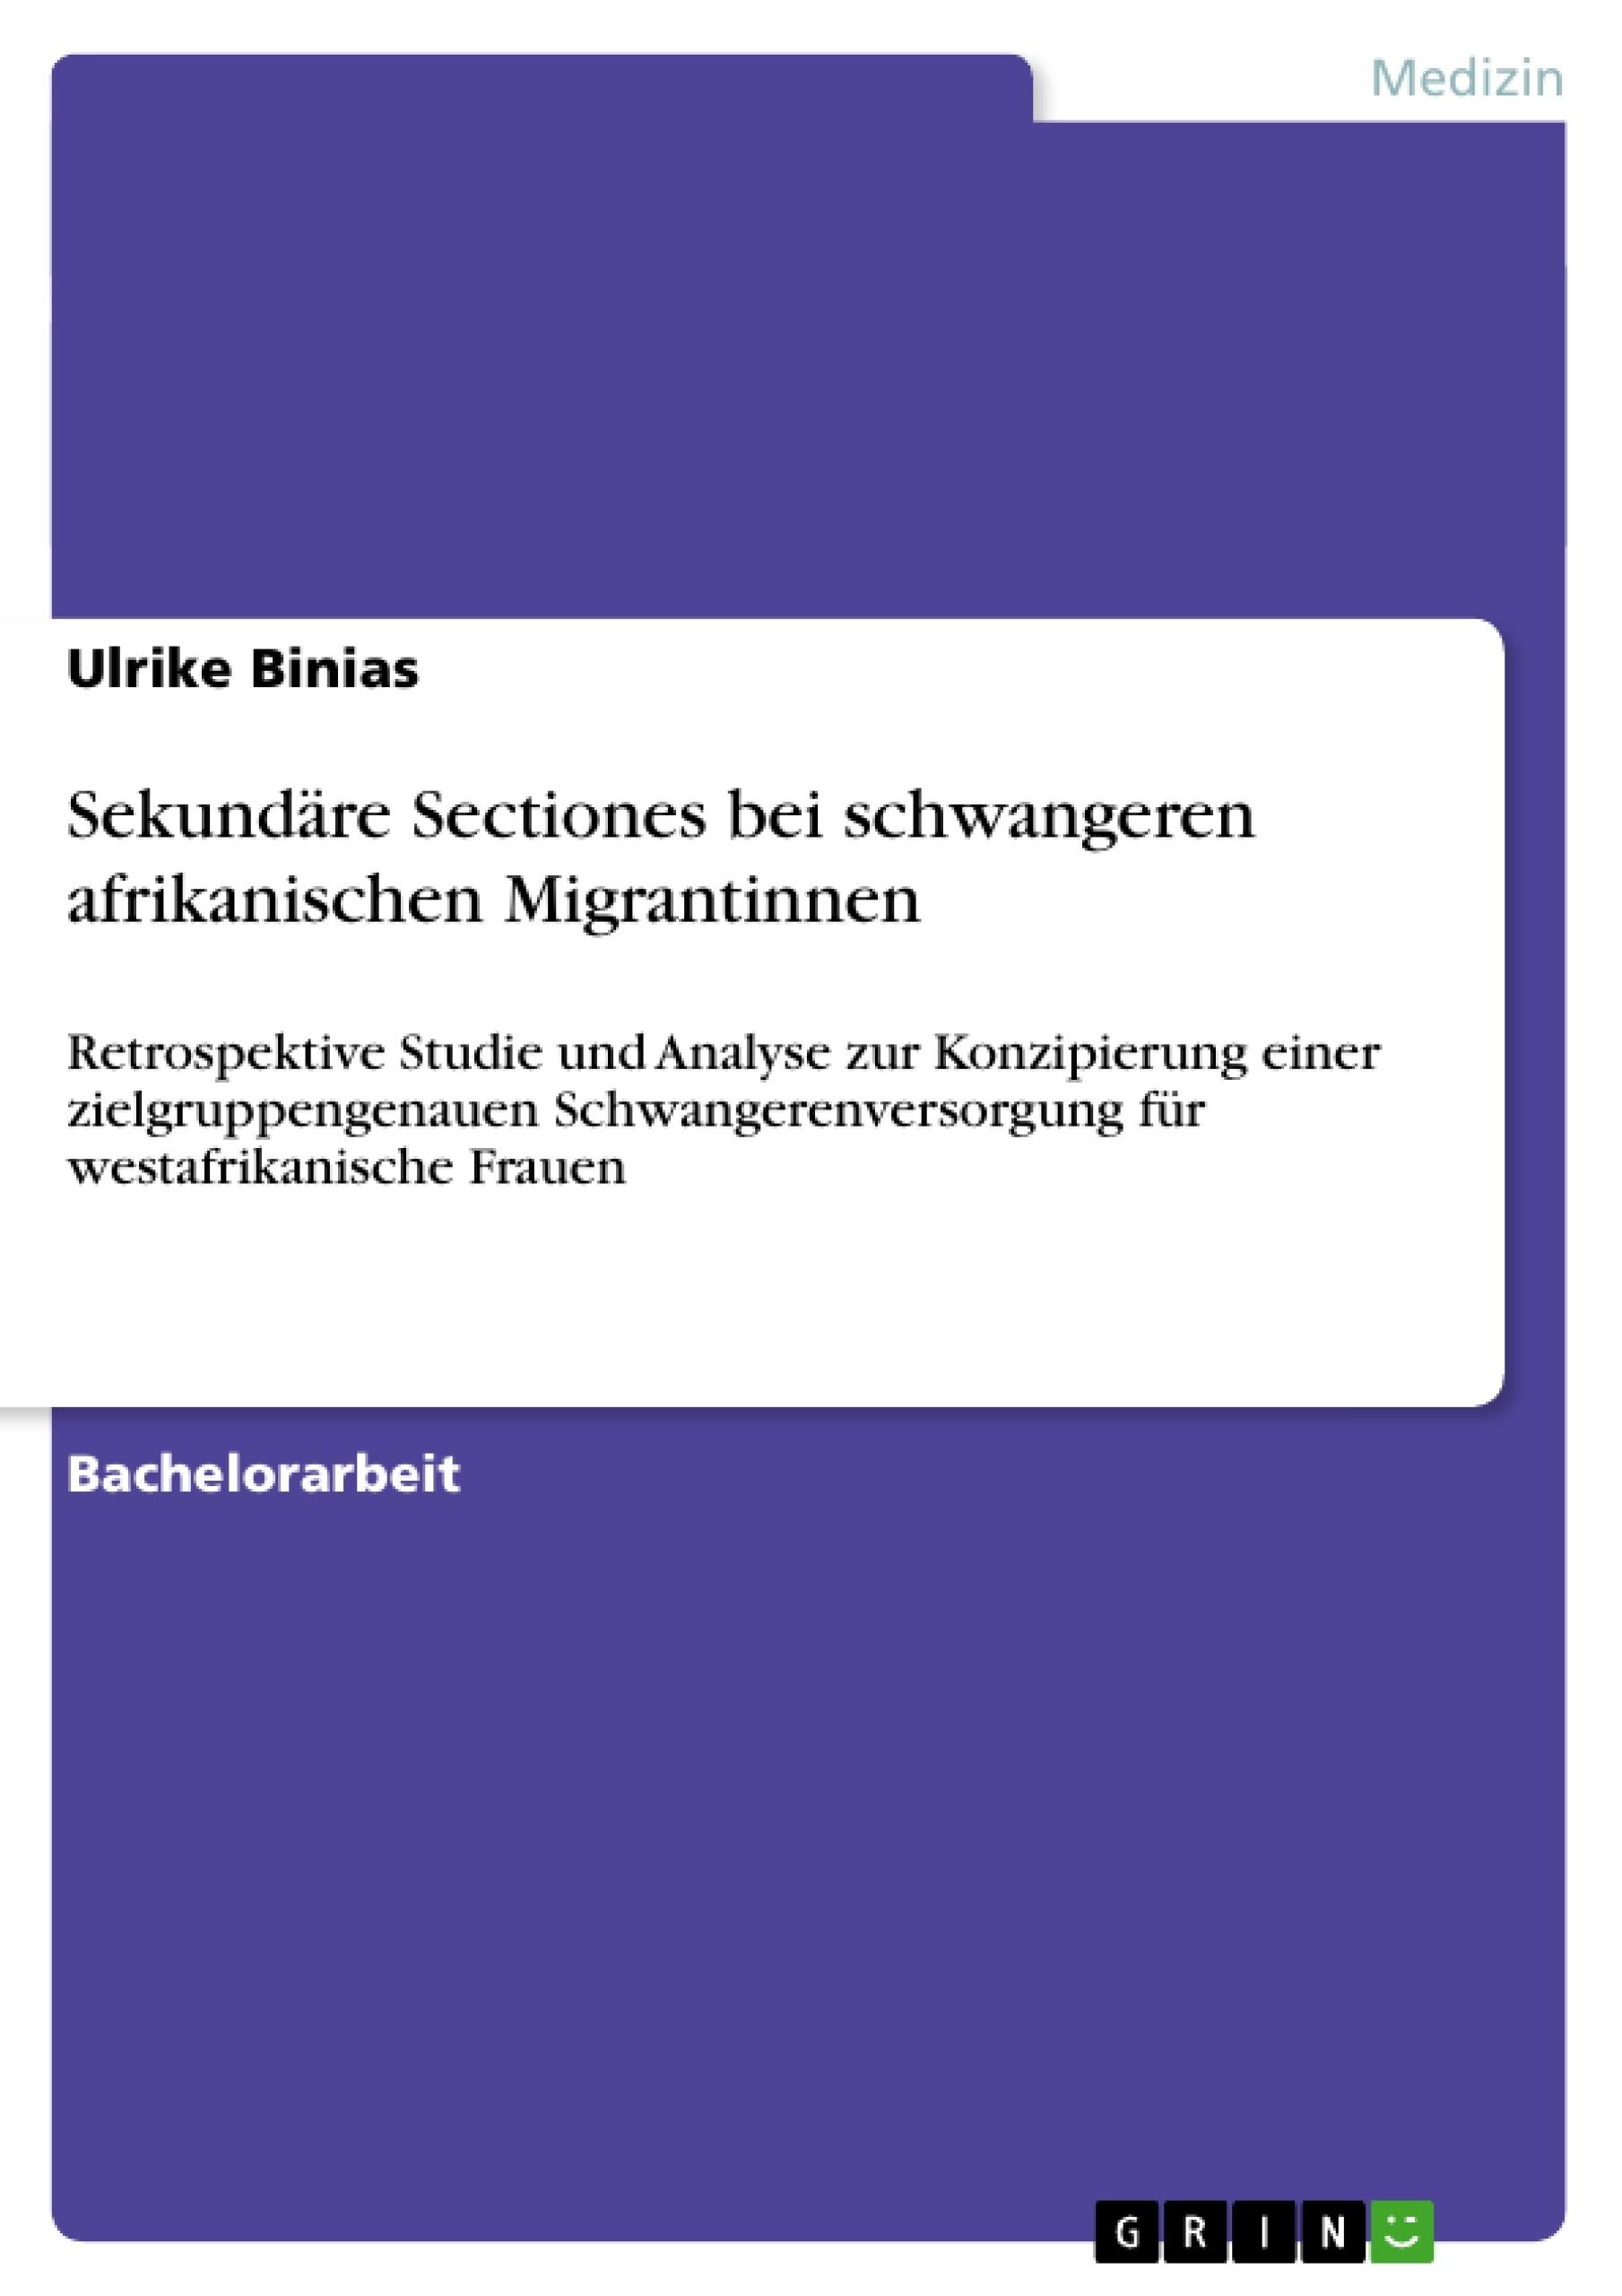 Titel: Sekundäre Sectiones bei schwangeren afrikanischen Migrantinnen